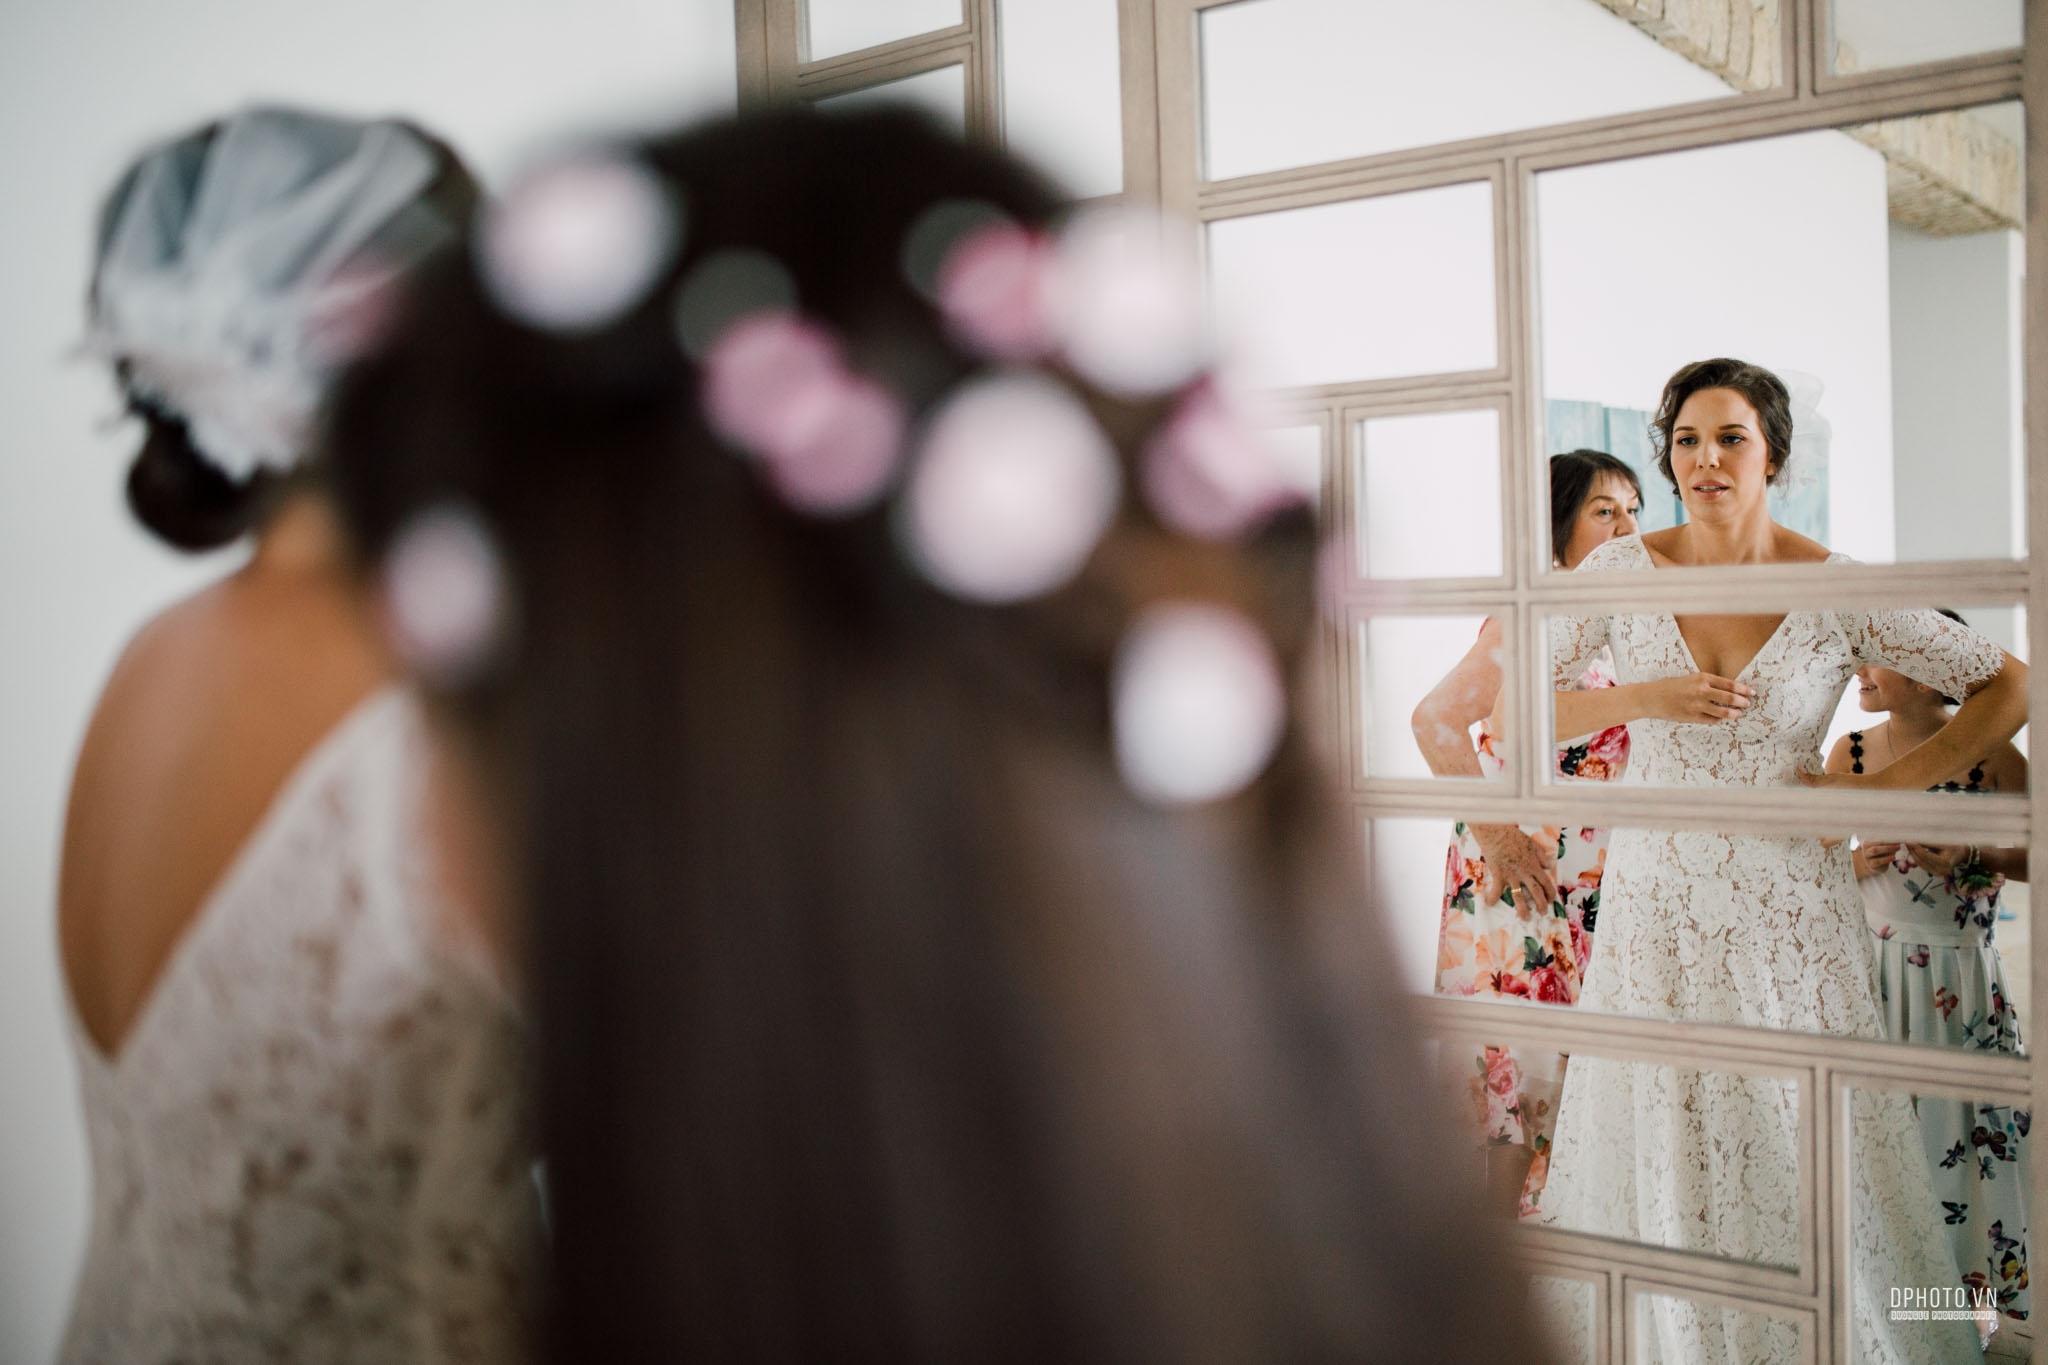 nha_trang_wedding_photographer_93